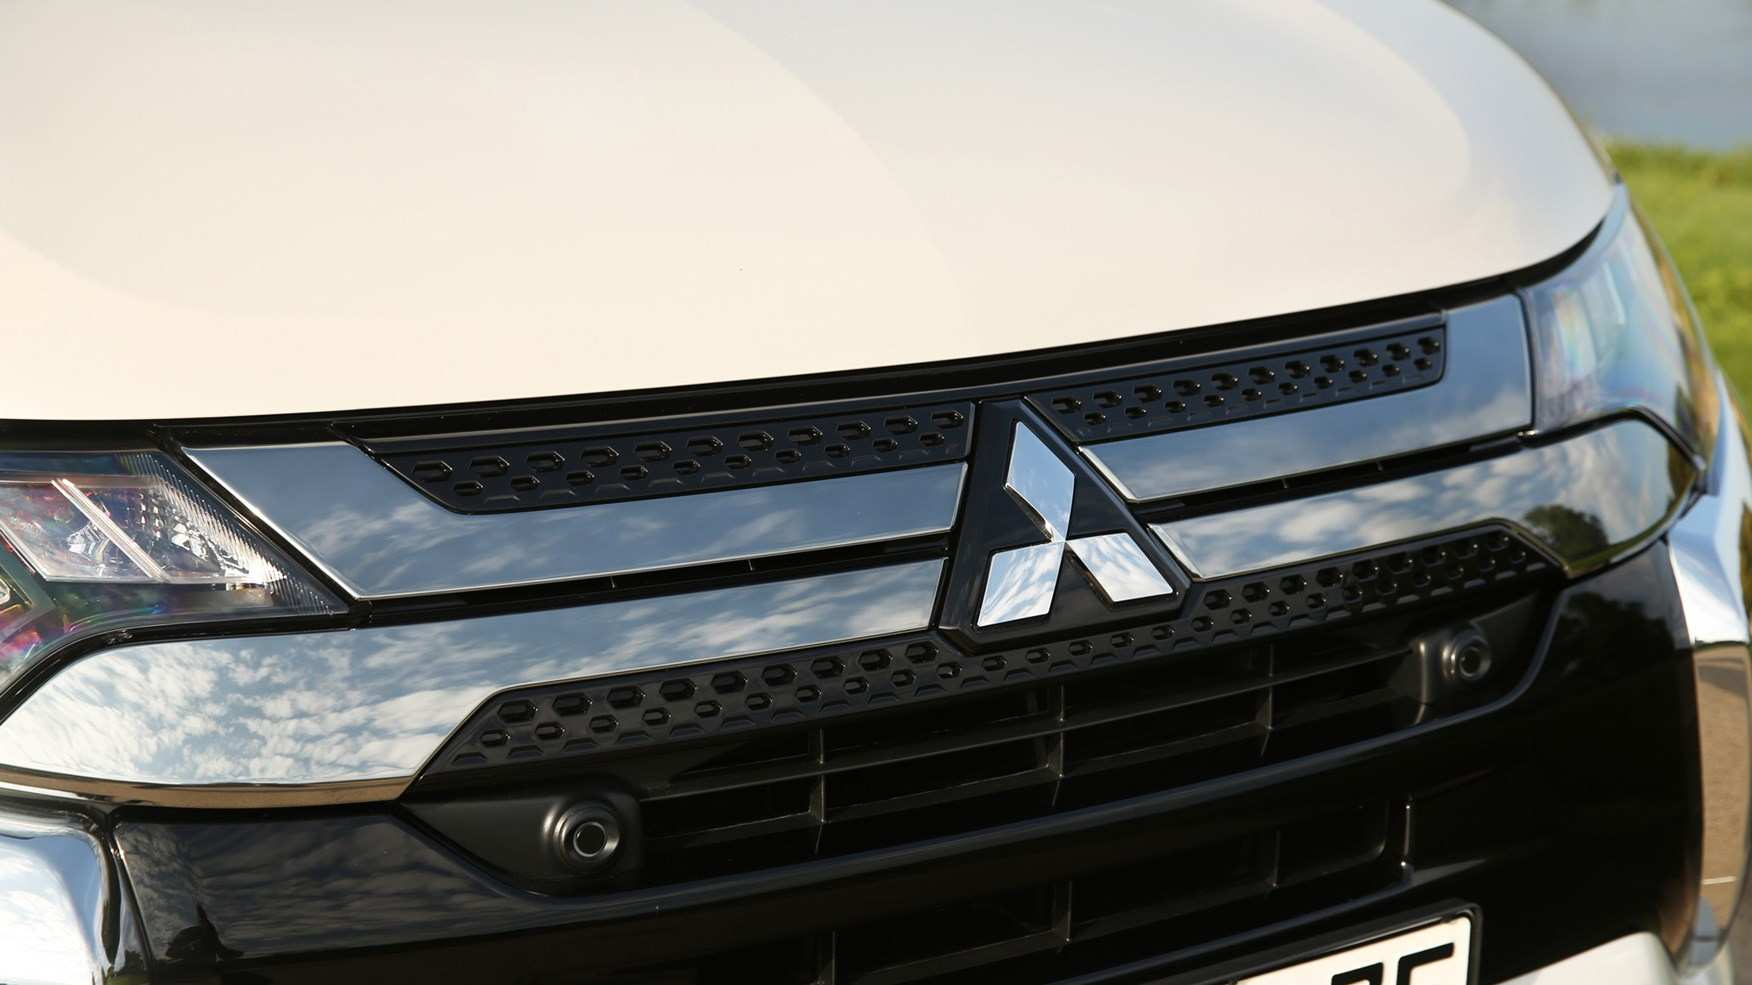 54 New 2019 Mitsubishi Outlander Phev Review Spy Shoot for 2019 Mitsubishi Outlander Phev Review